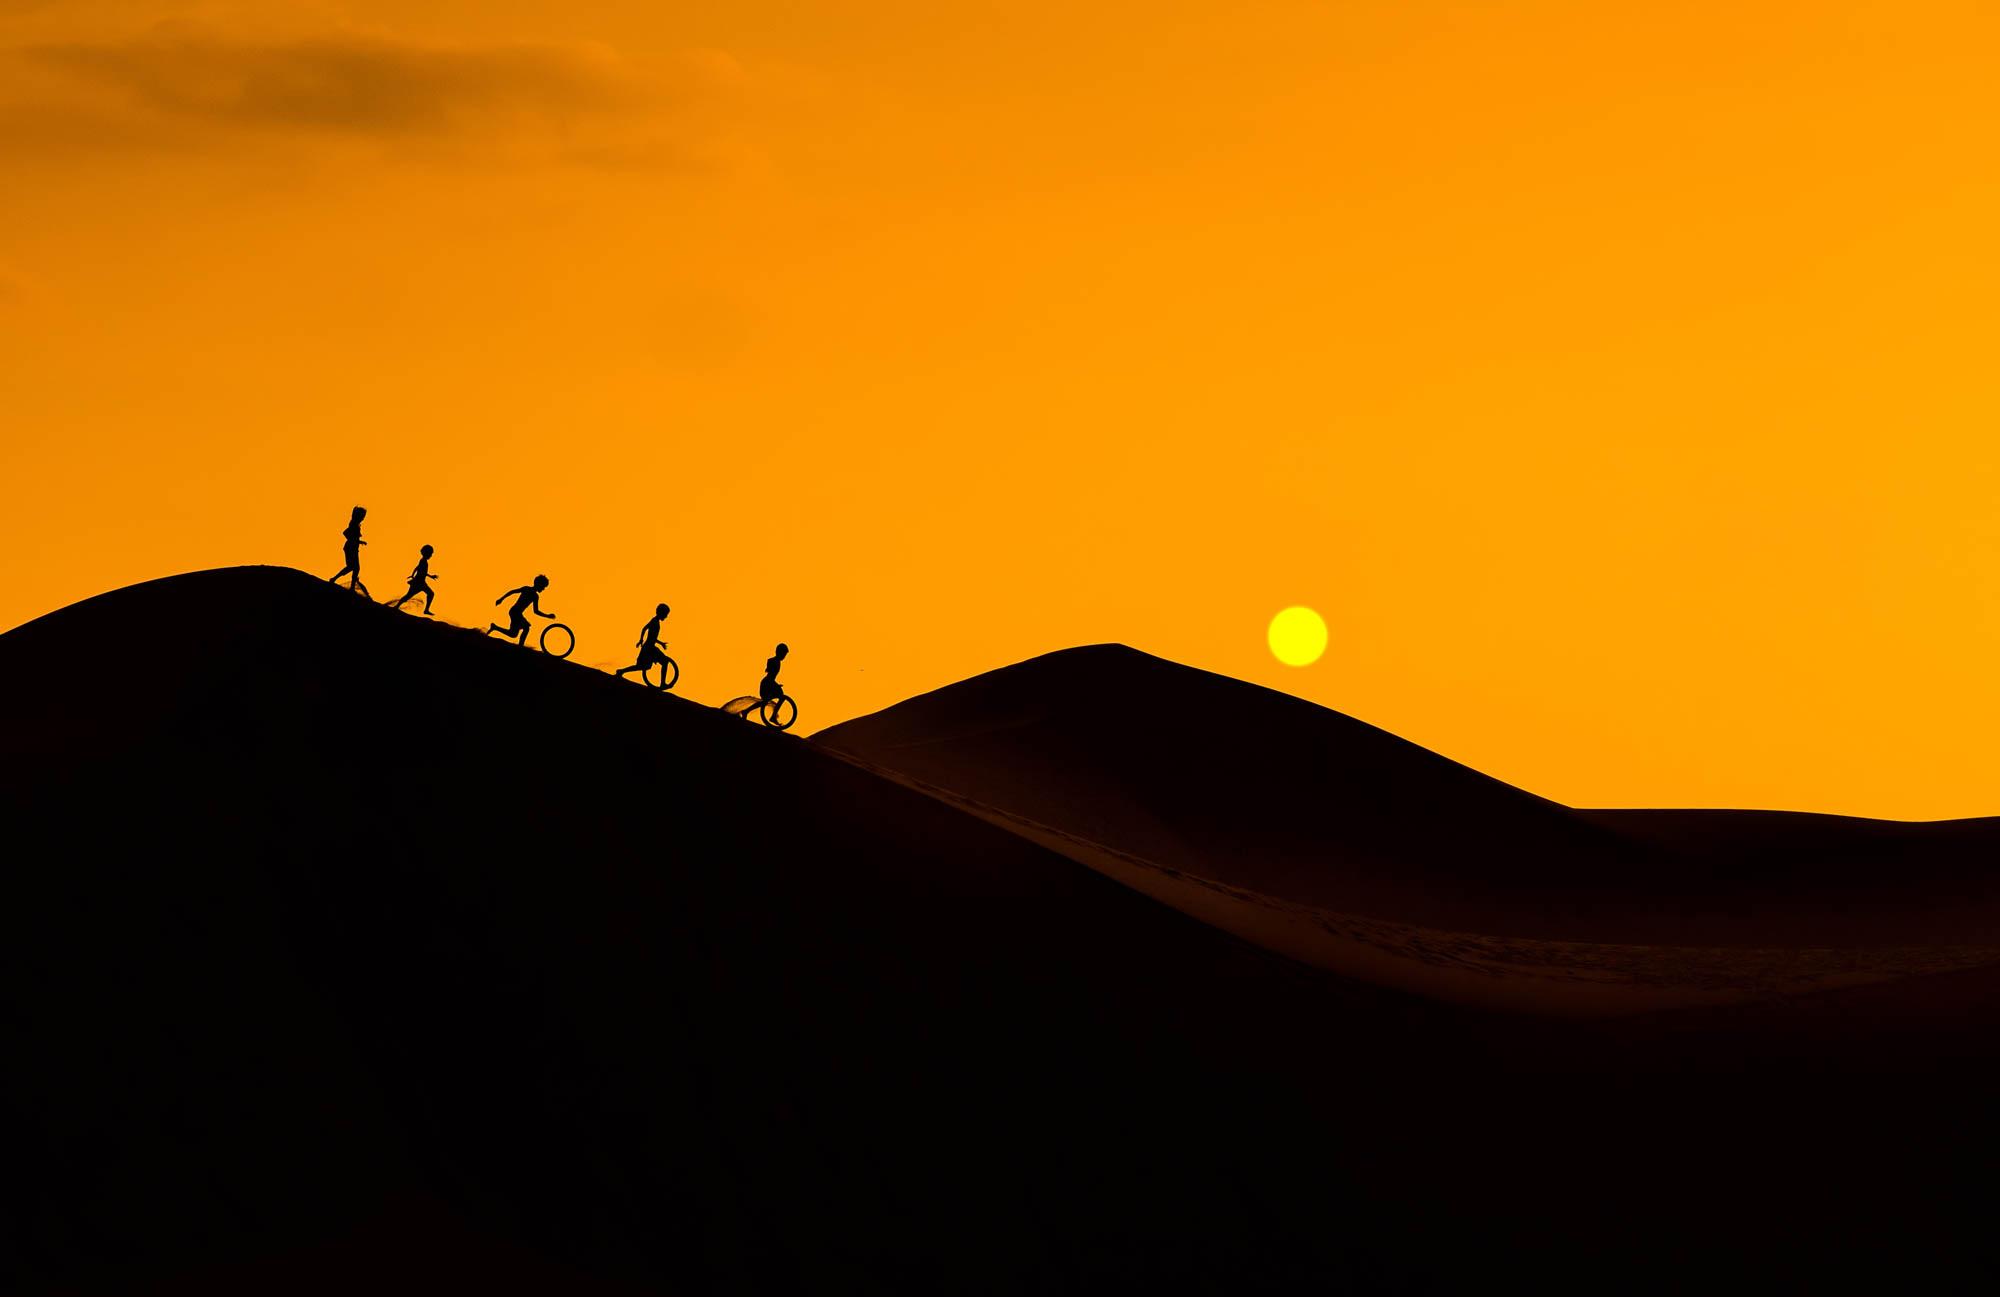 Silhouette of children playing on in the desert Vietnam